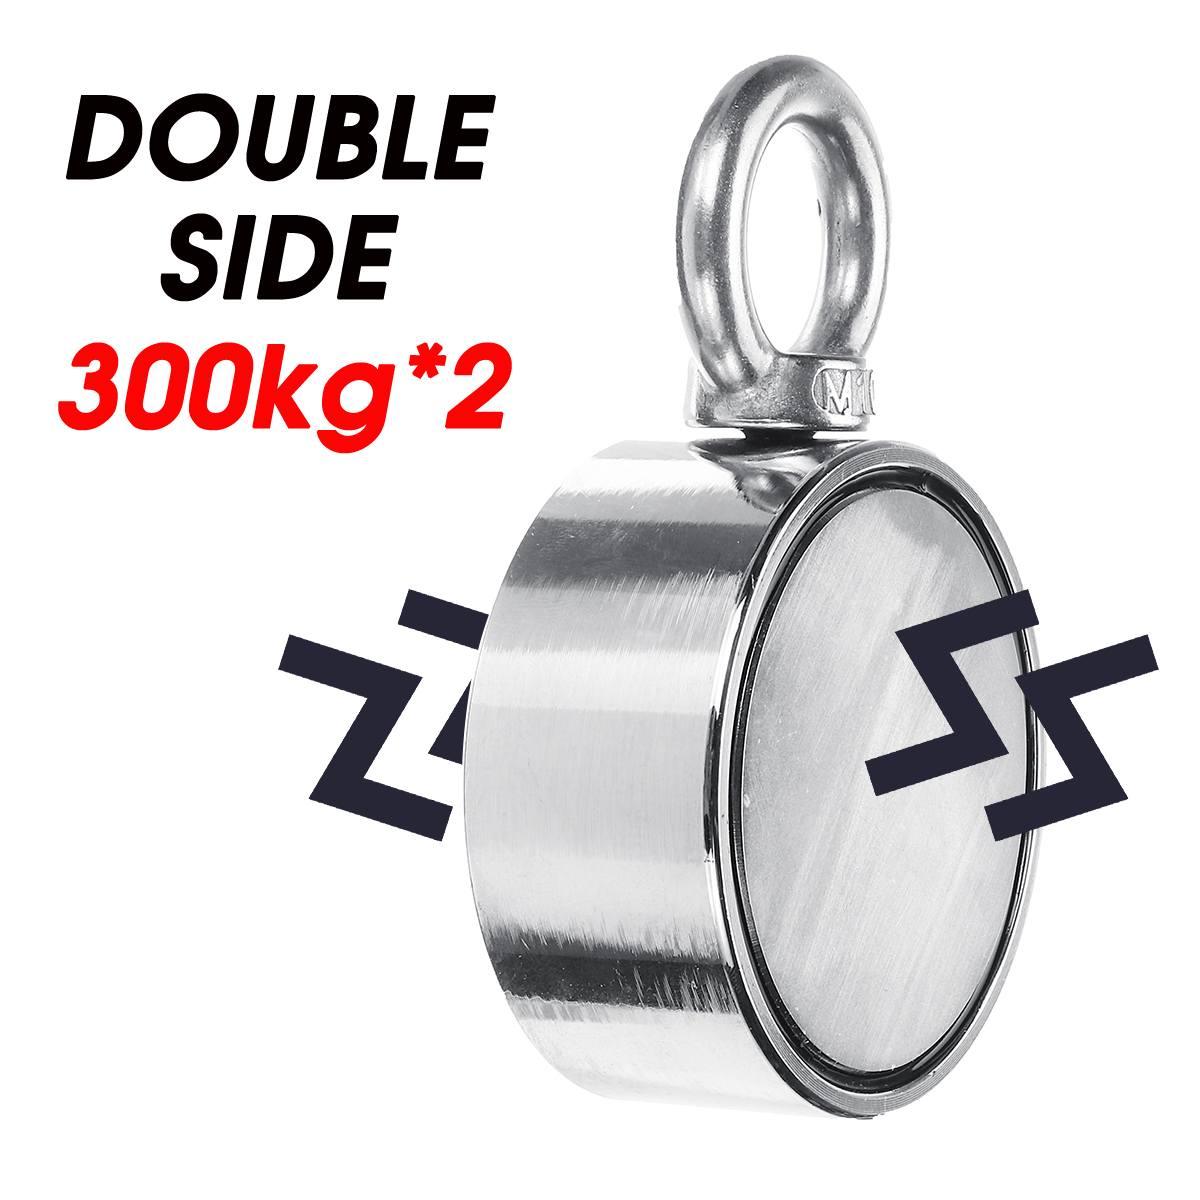 10 Stücke Potentiometer Trimmer Widerstand Smd Smt Topf 3X3 20/% 100 Kohm 10 tg